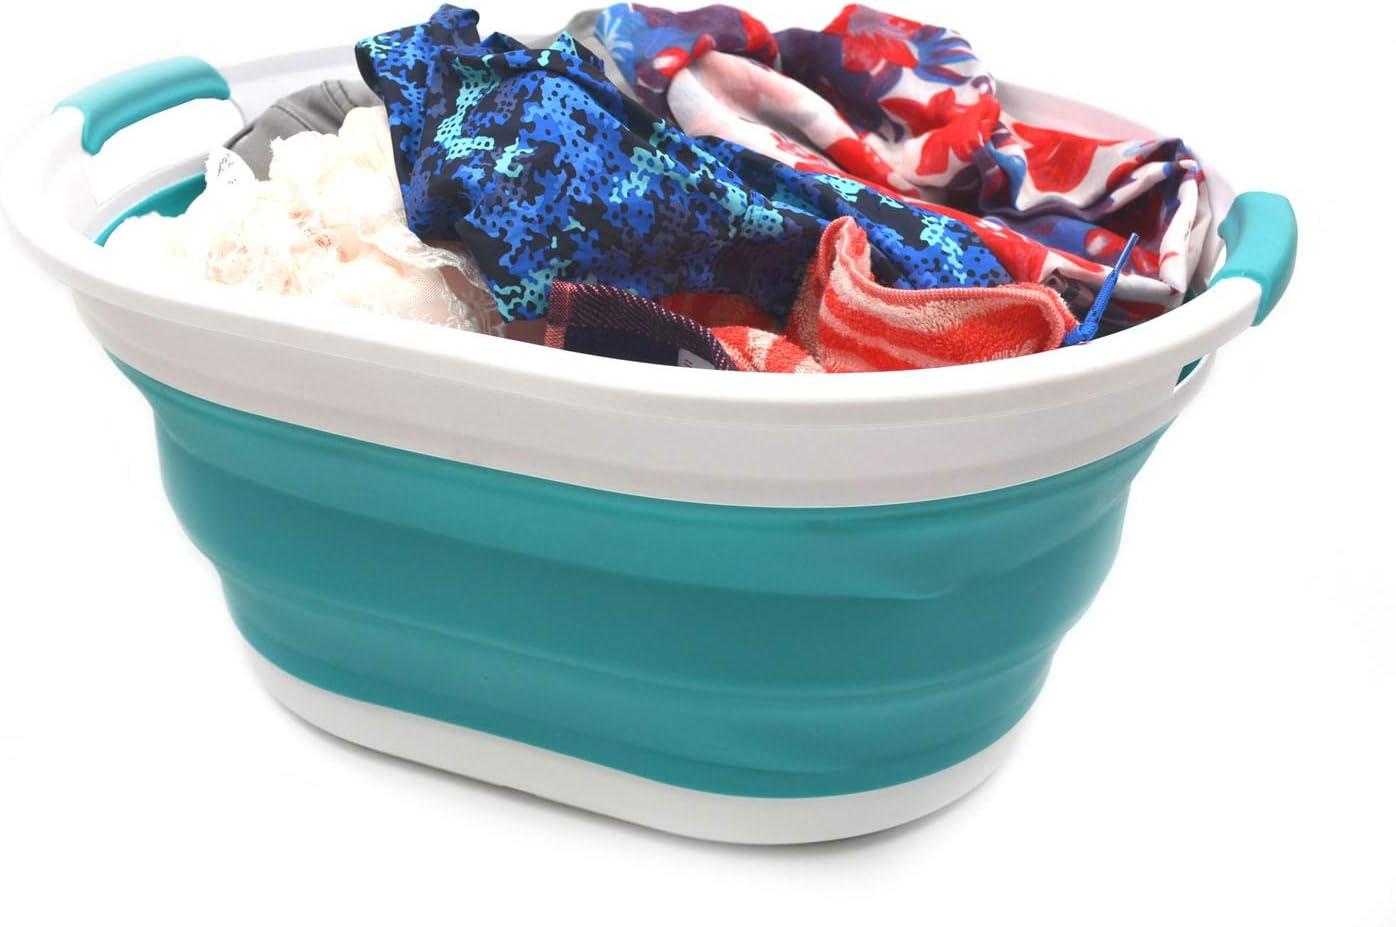 Foldable Storage Container//Organizer Portable Washing Tub Space Saving Laundry Hamper SAMMART Set of 2 Collapsible Plastic Laundry Basket Oval Tub//Basket 2, Bright Blue